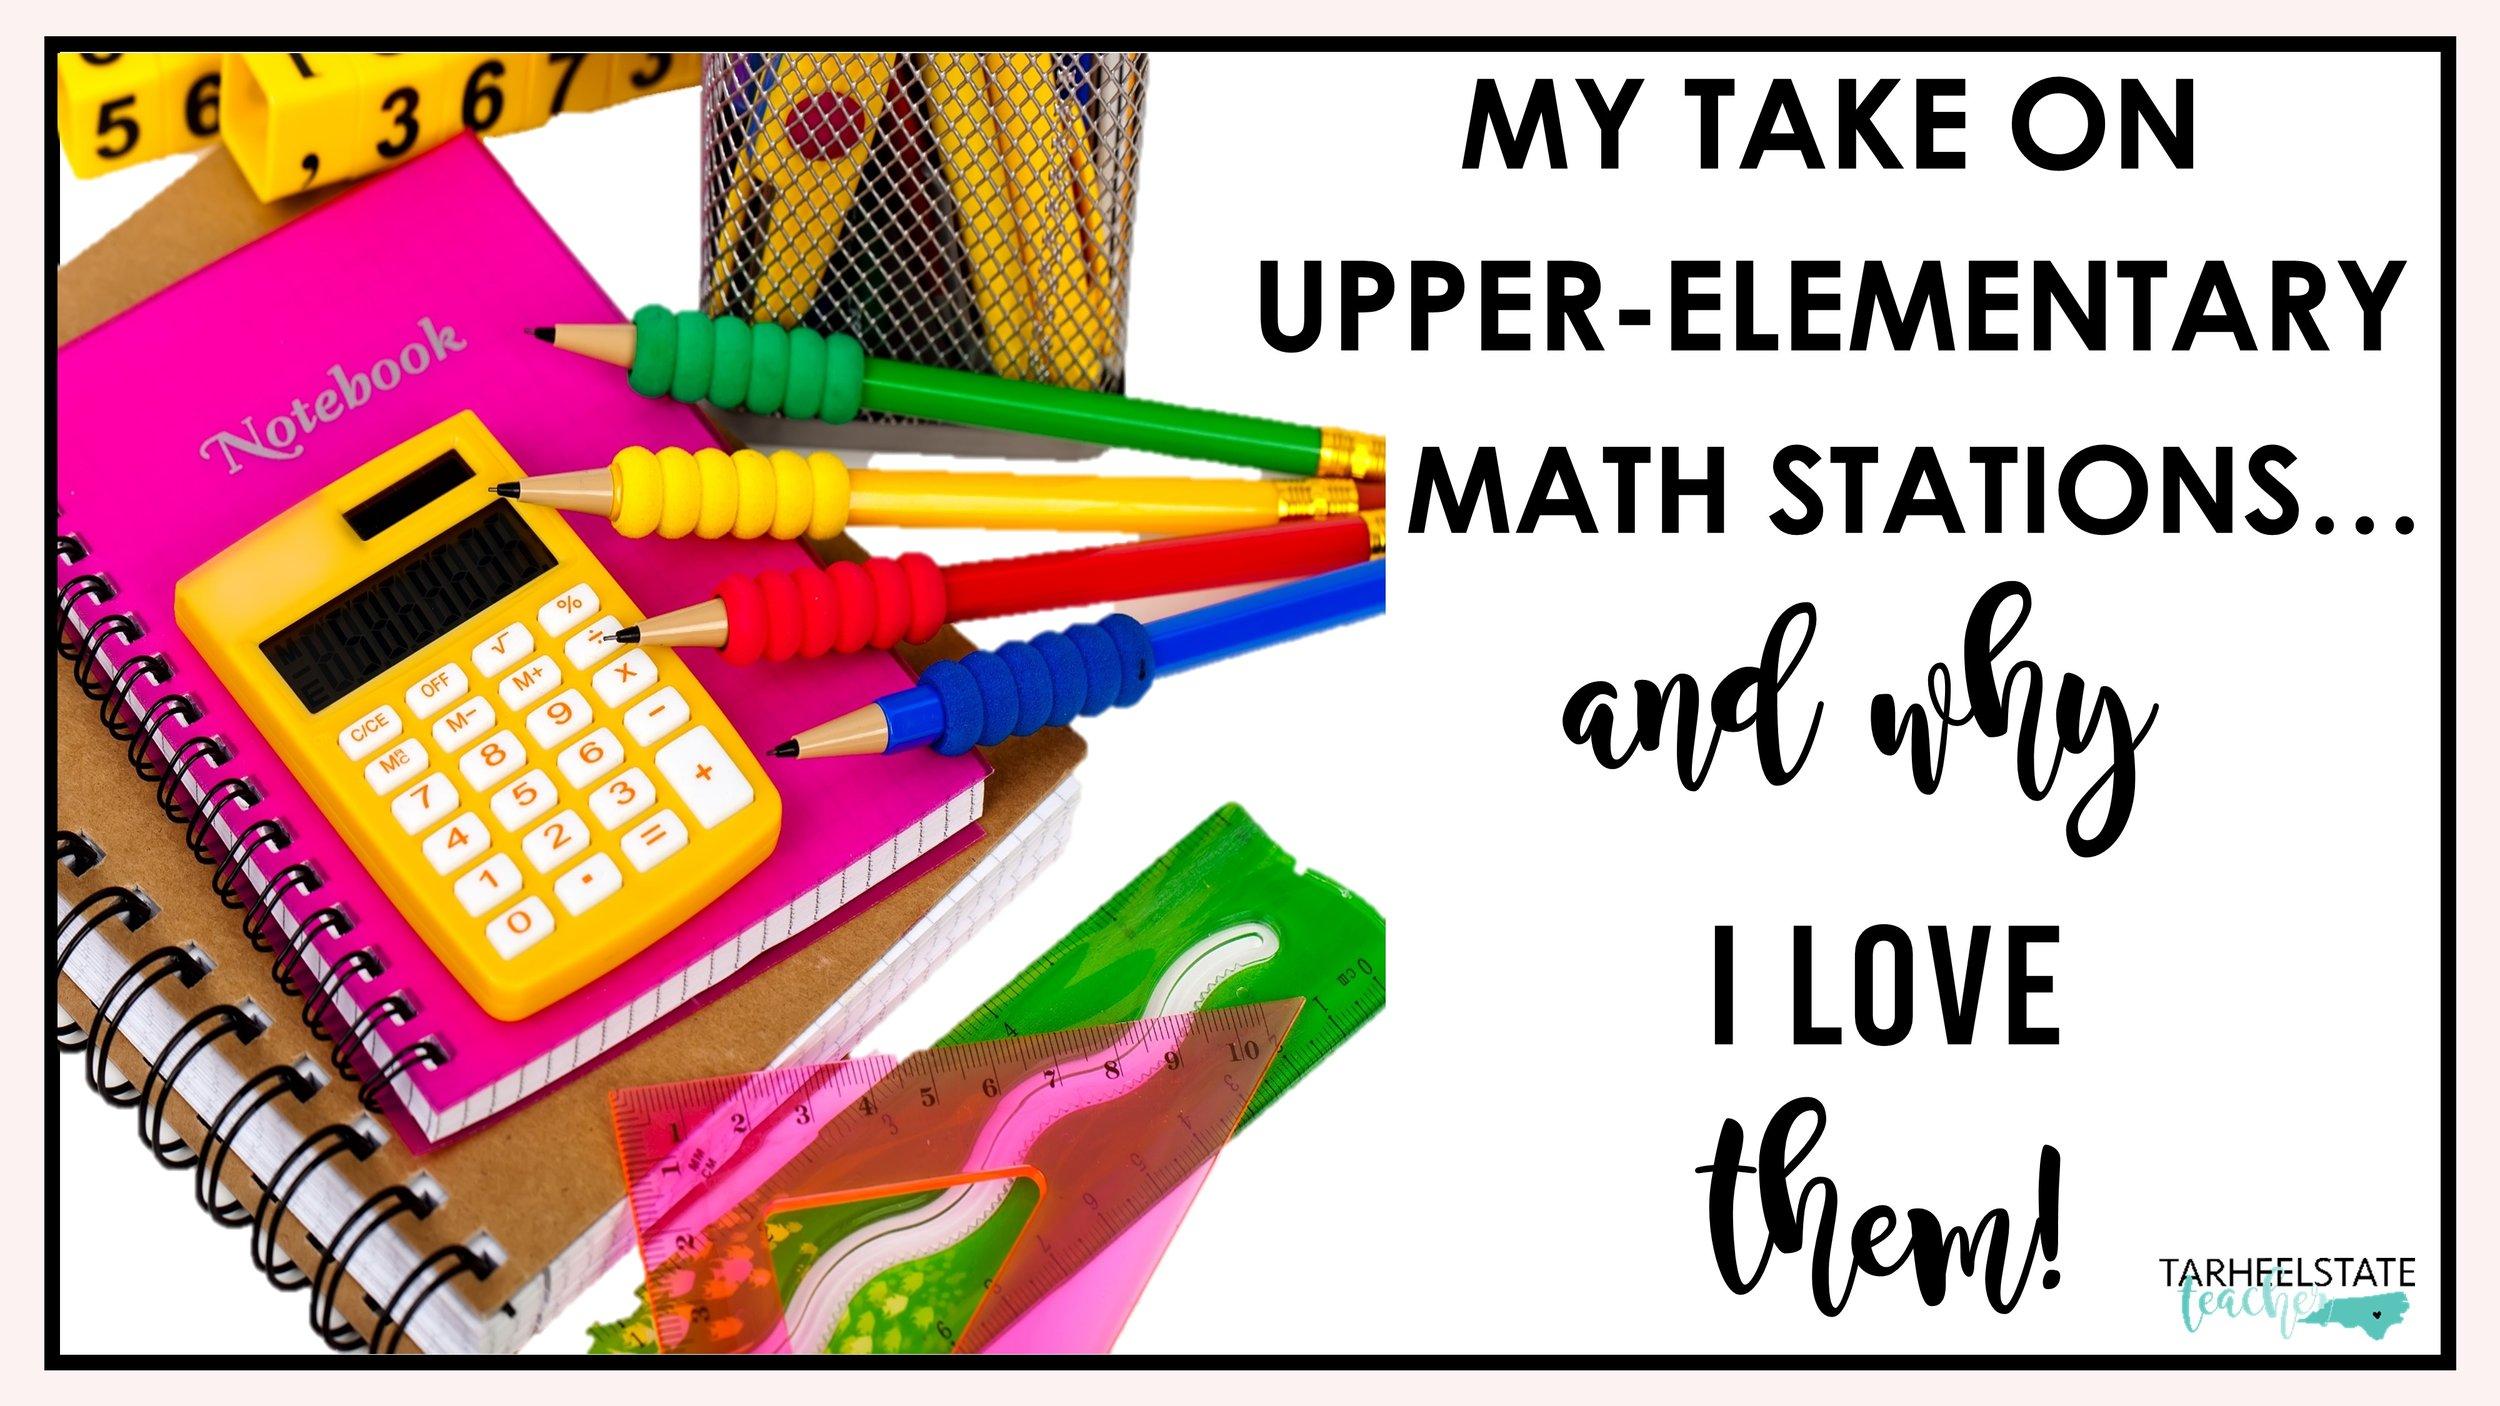 My take on upper-elementary math stations.JPG